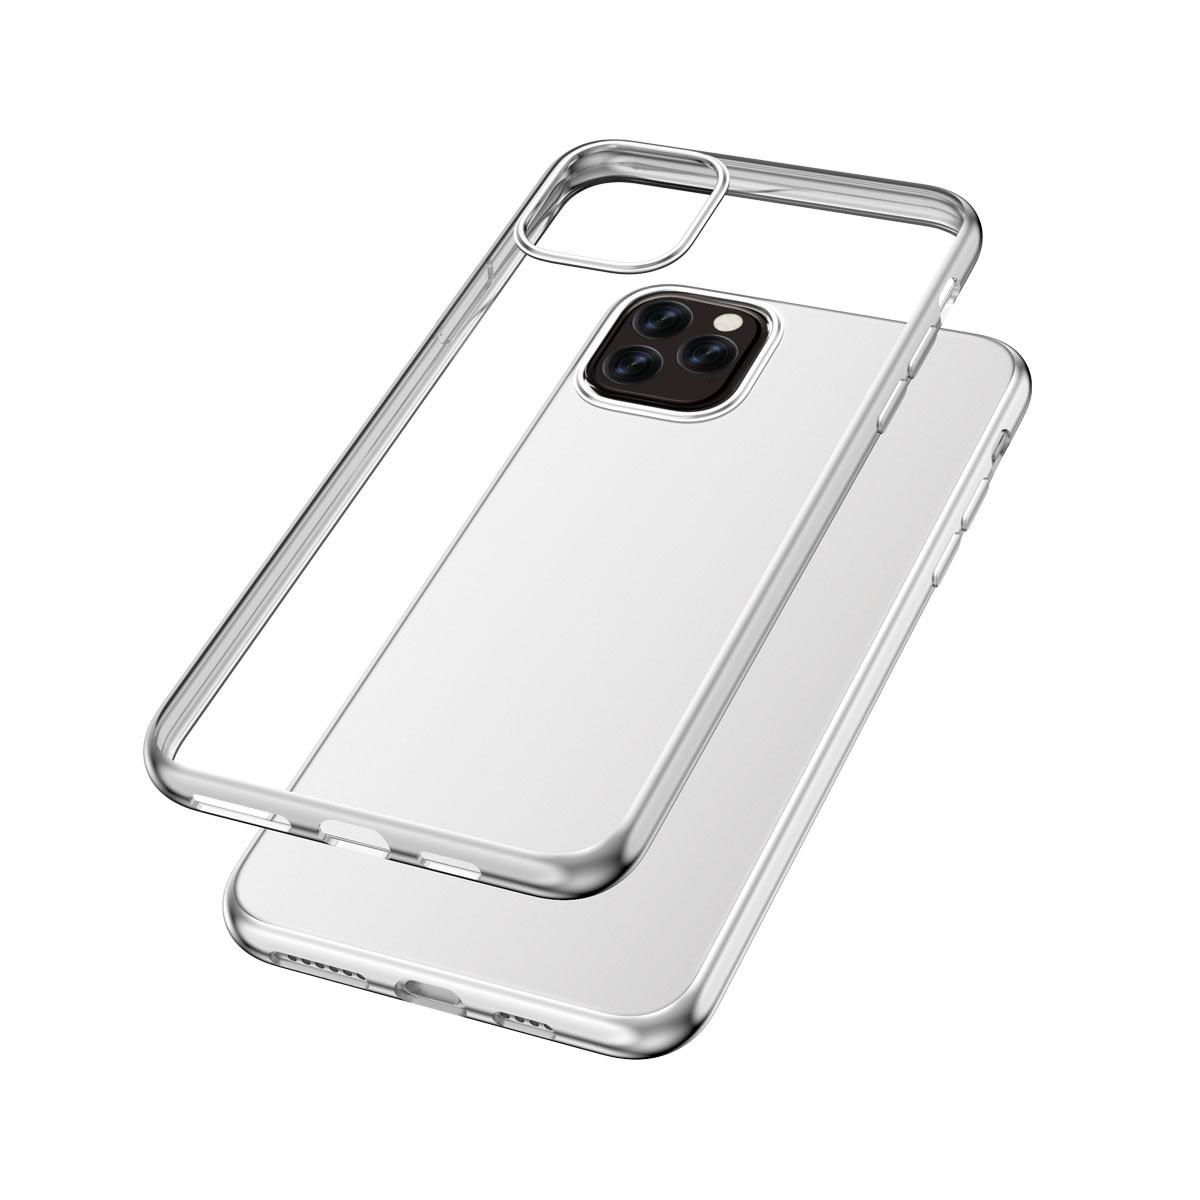 Capac protectie spate cellara colectia electro pentru iphone 11 pro - argintiu